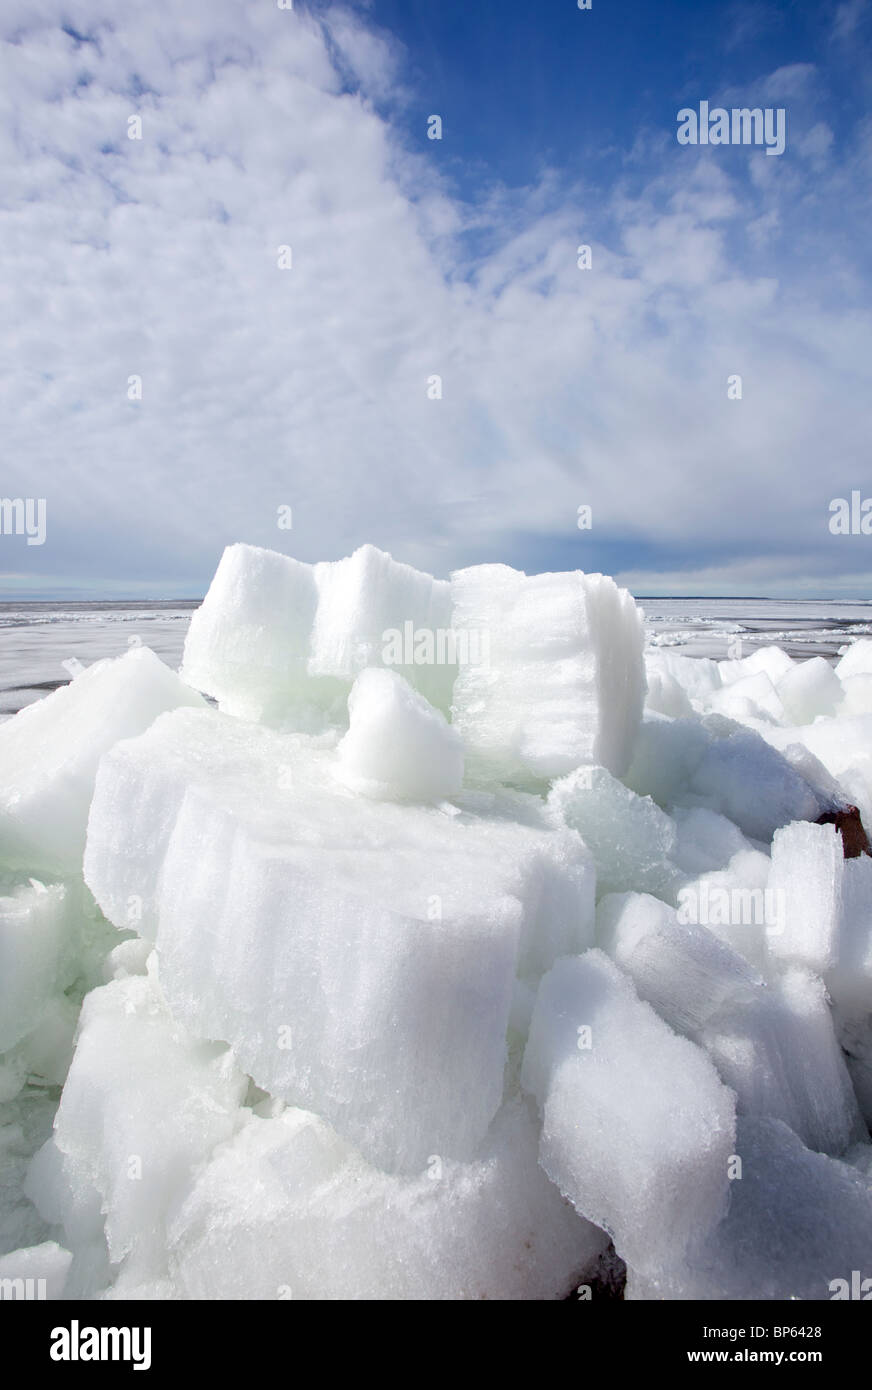 Melting ice blocks at seashore , Finland - Stock Image